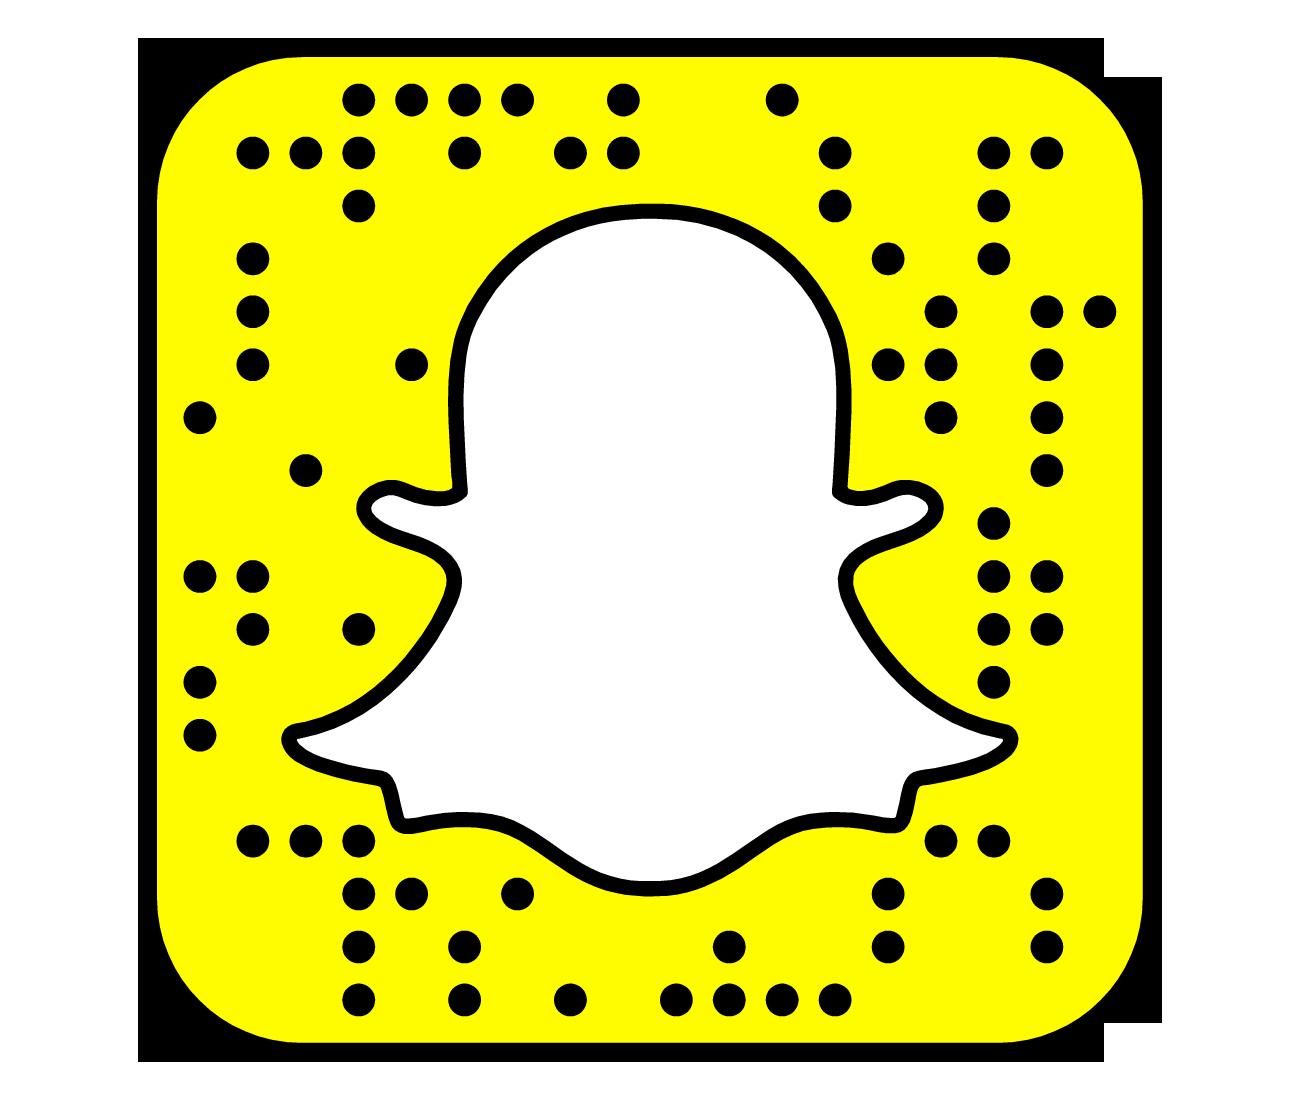 snapchat logo transparent - Snapchat Logo PNG